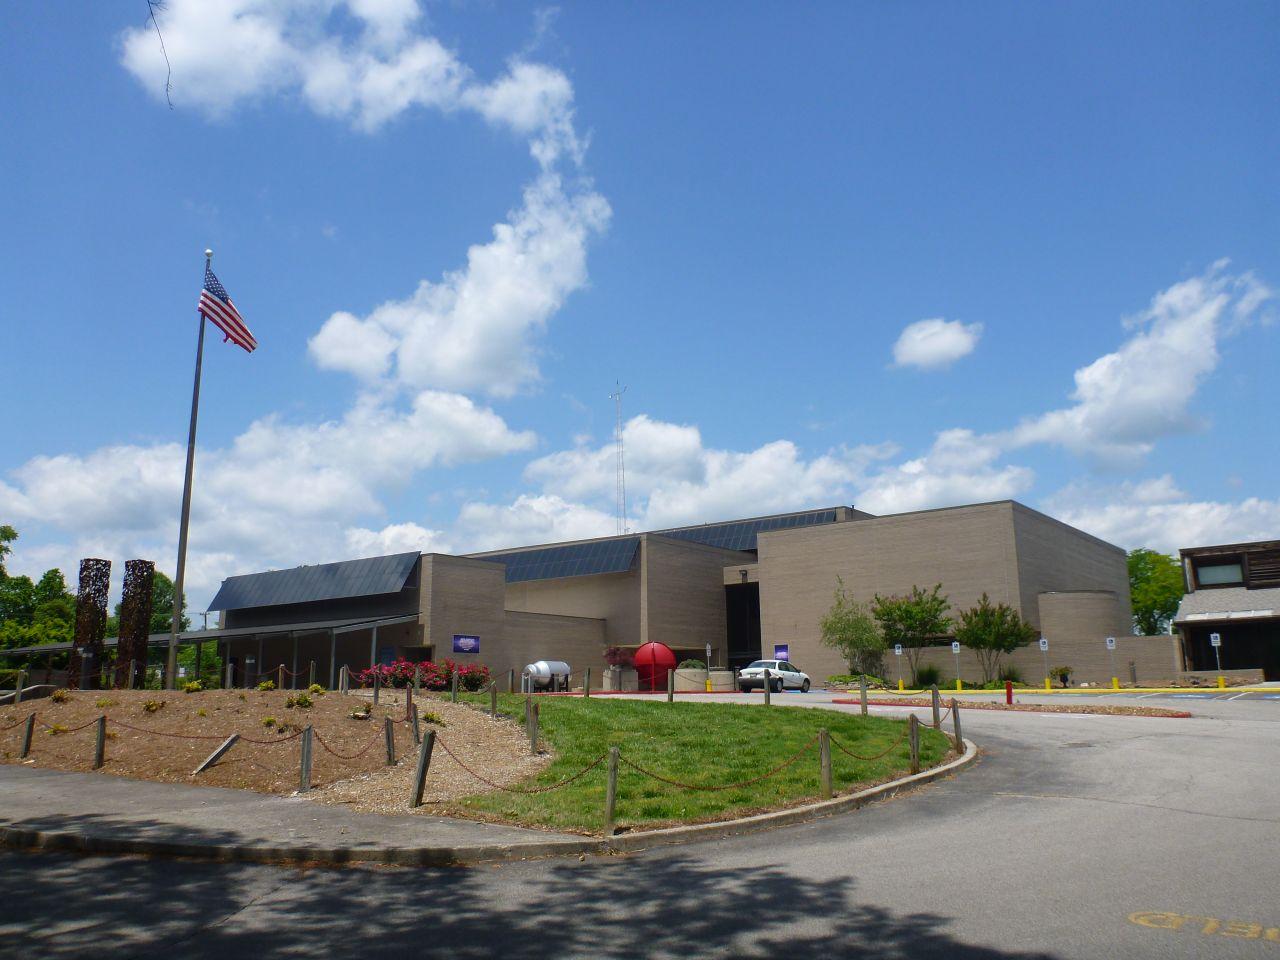 American Museum Of Science And History In Oak Ridge, TN